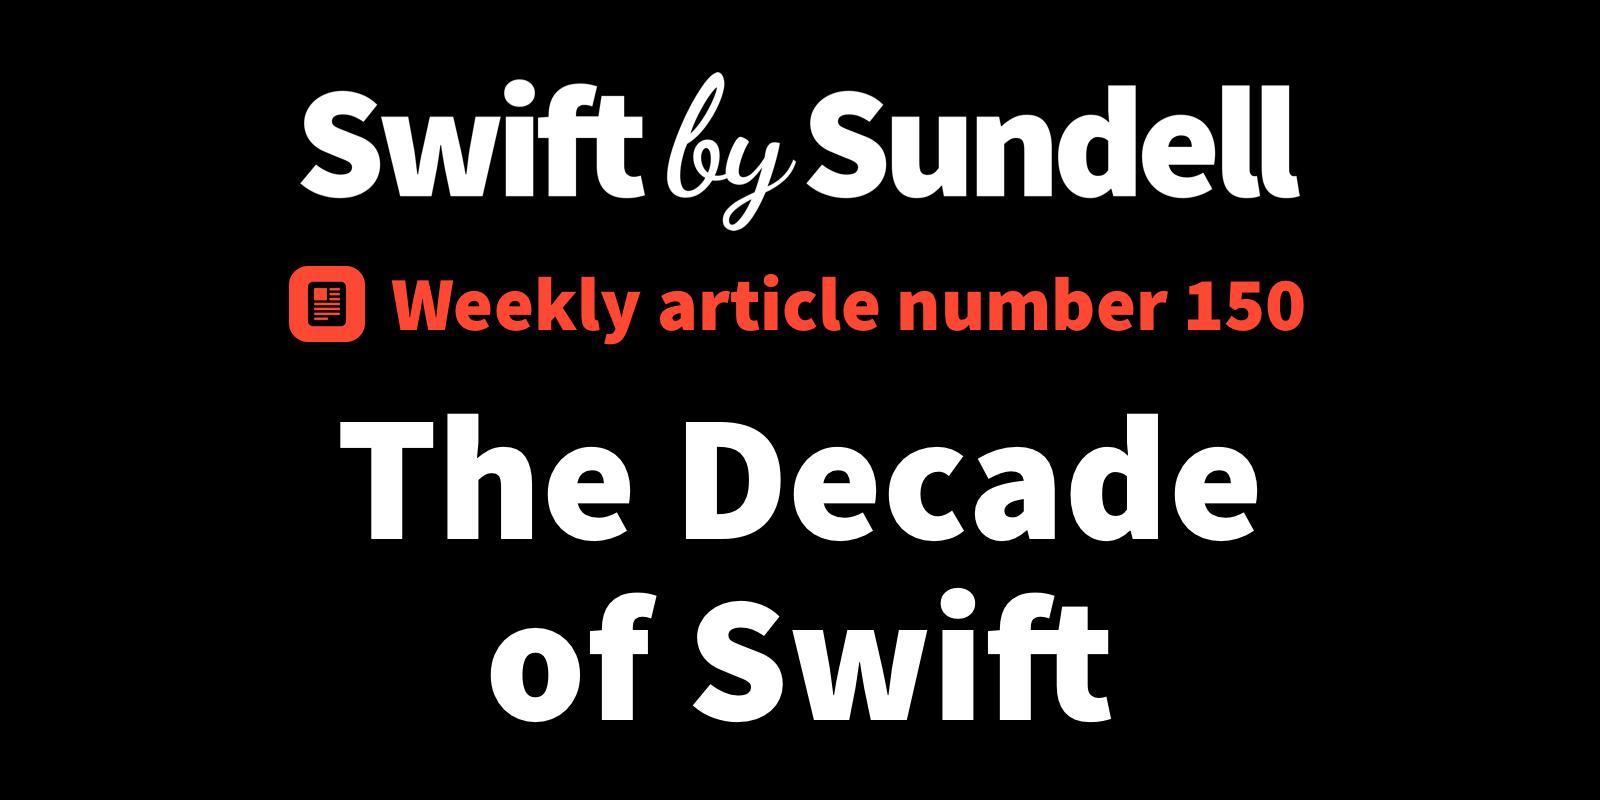 The Decade of Swift - RapidAPI